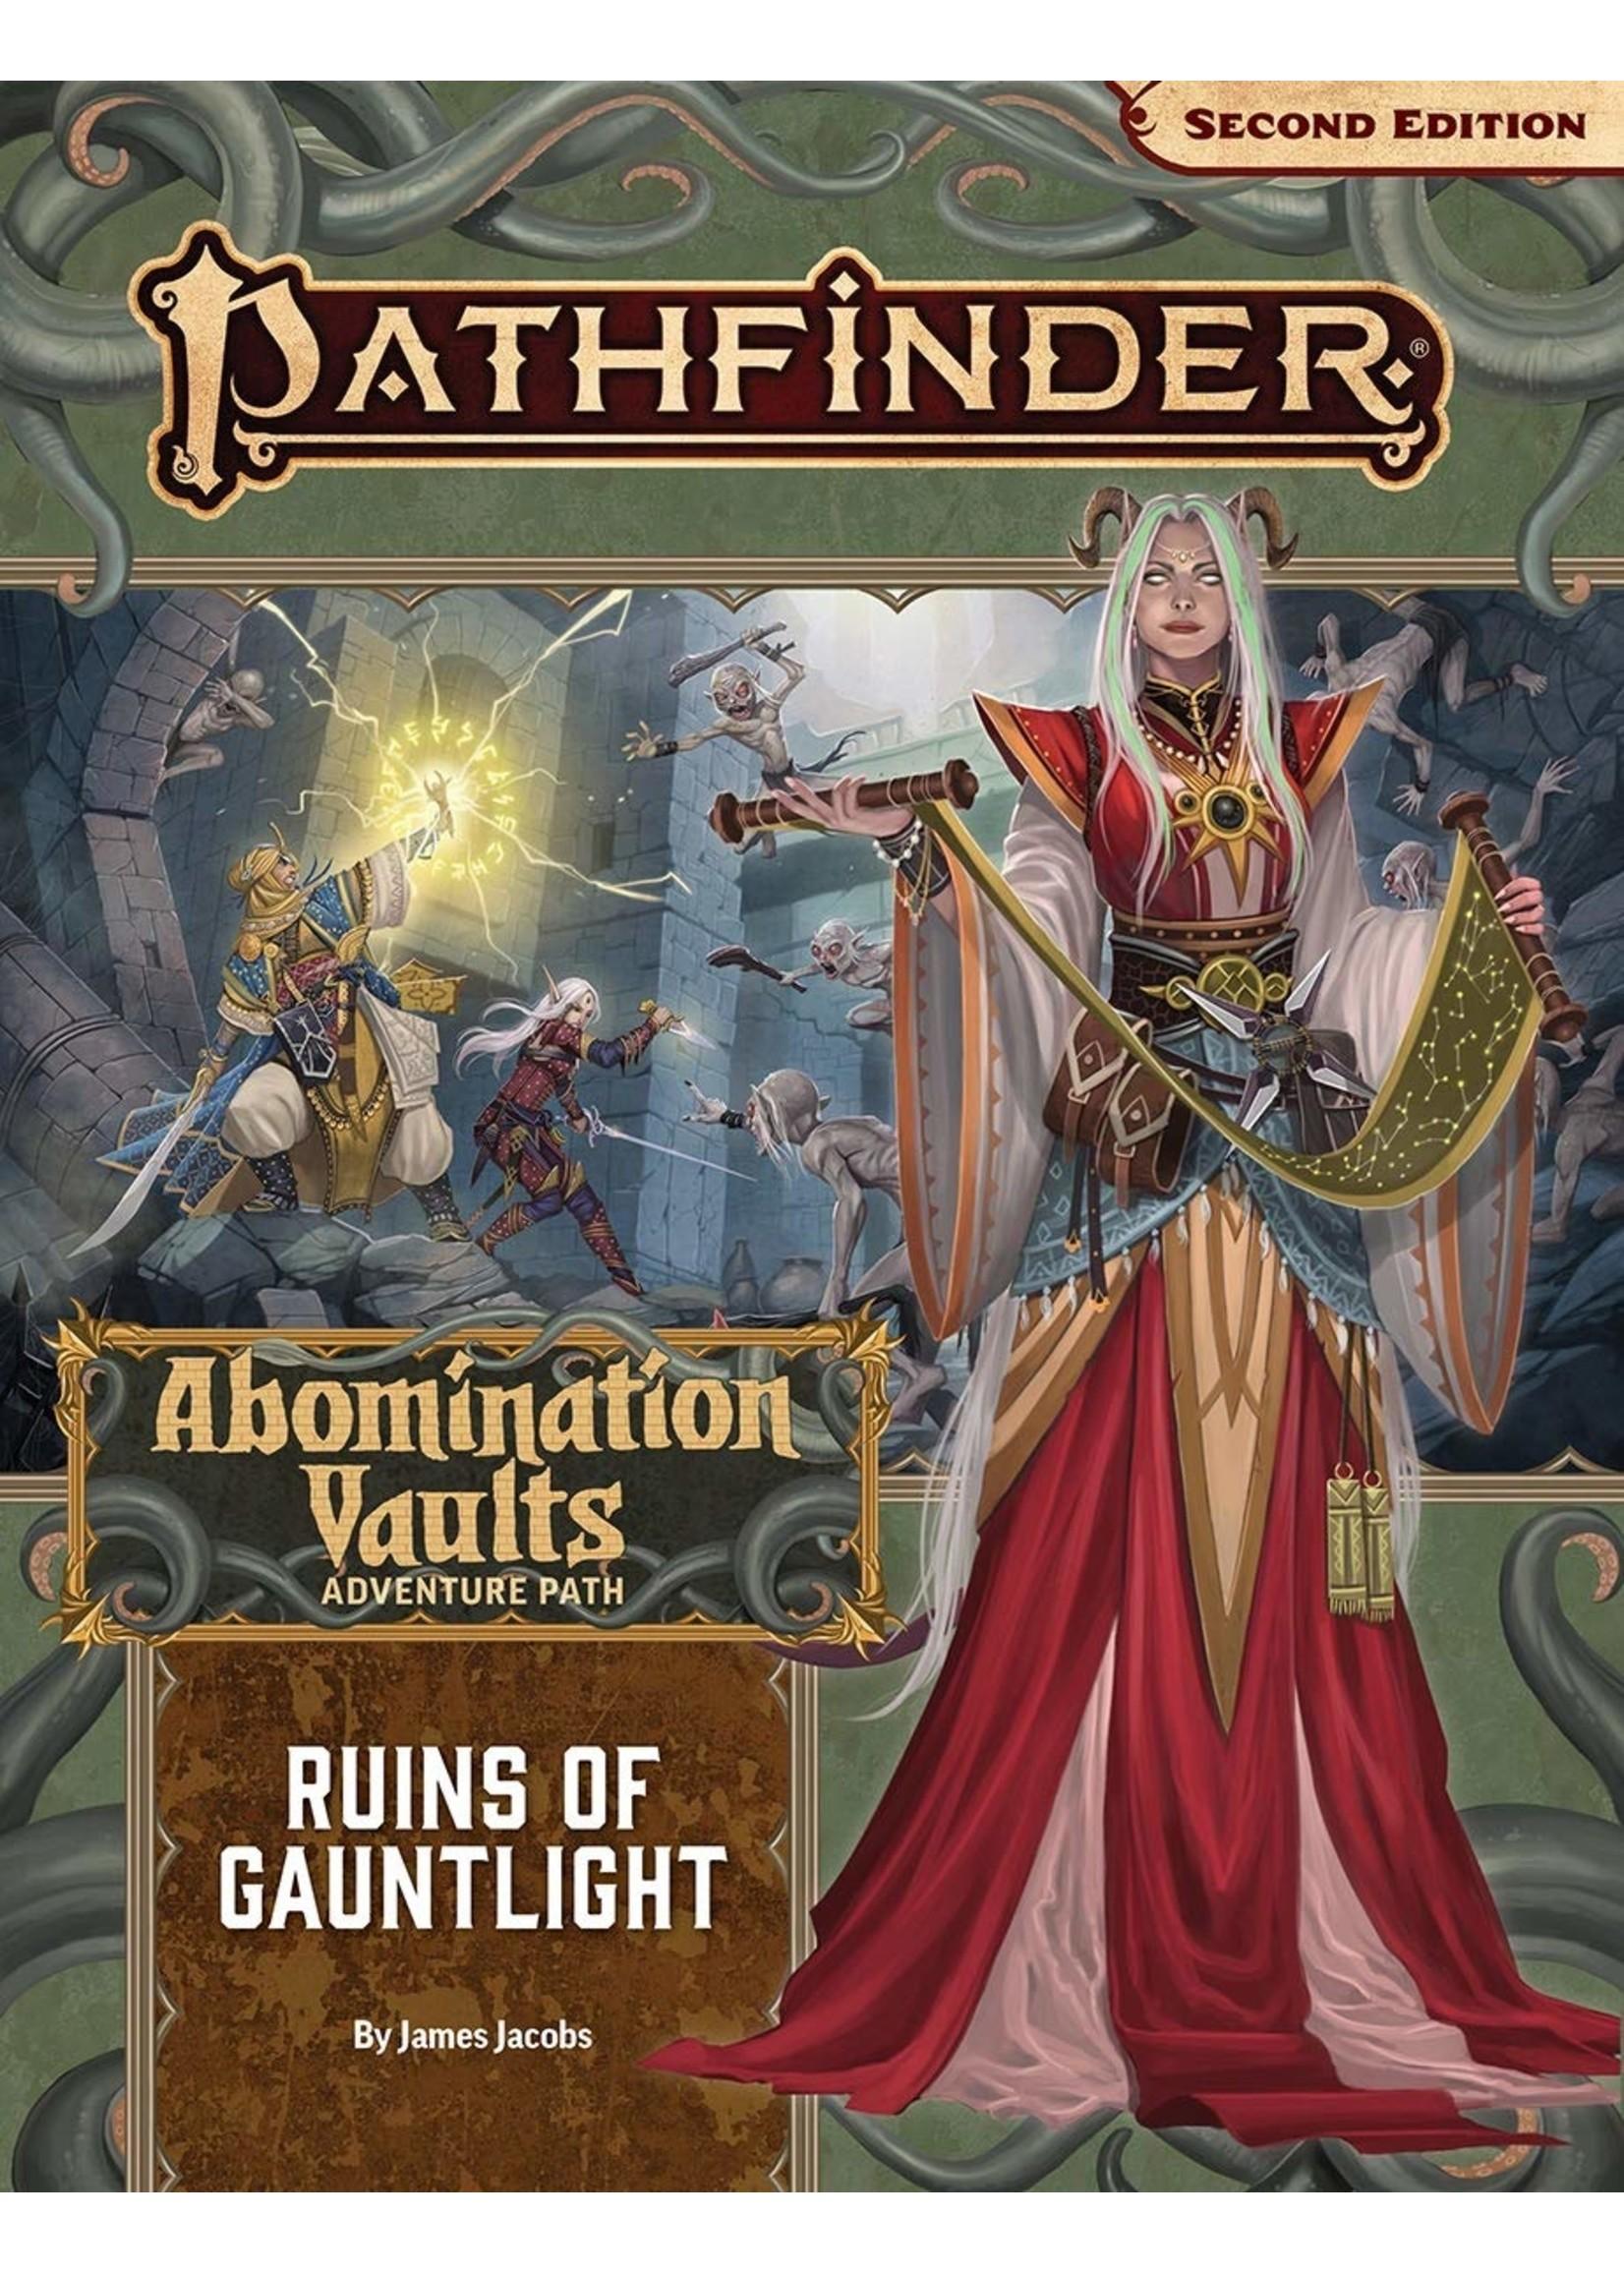 Pathfinder RPG: Adventure Path - Abomination Vaults Part 1 - Ruins of Gauntlight (P2)